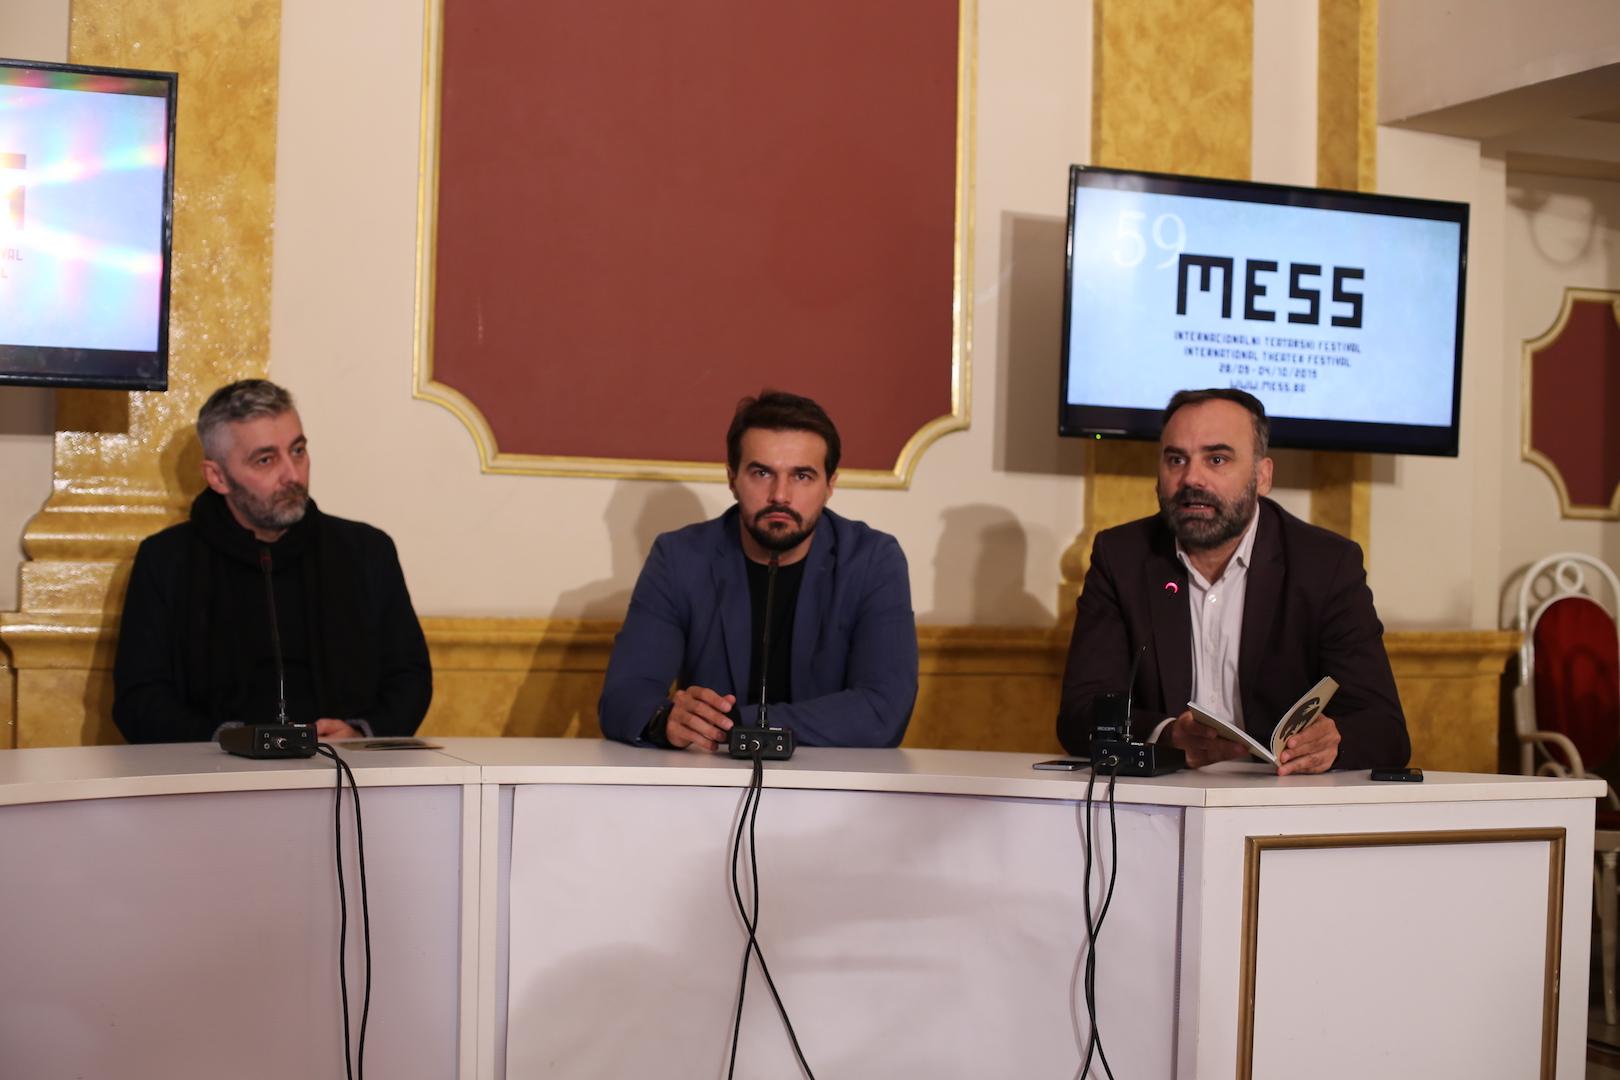 Press konferencija Festival MESS (7)